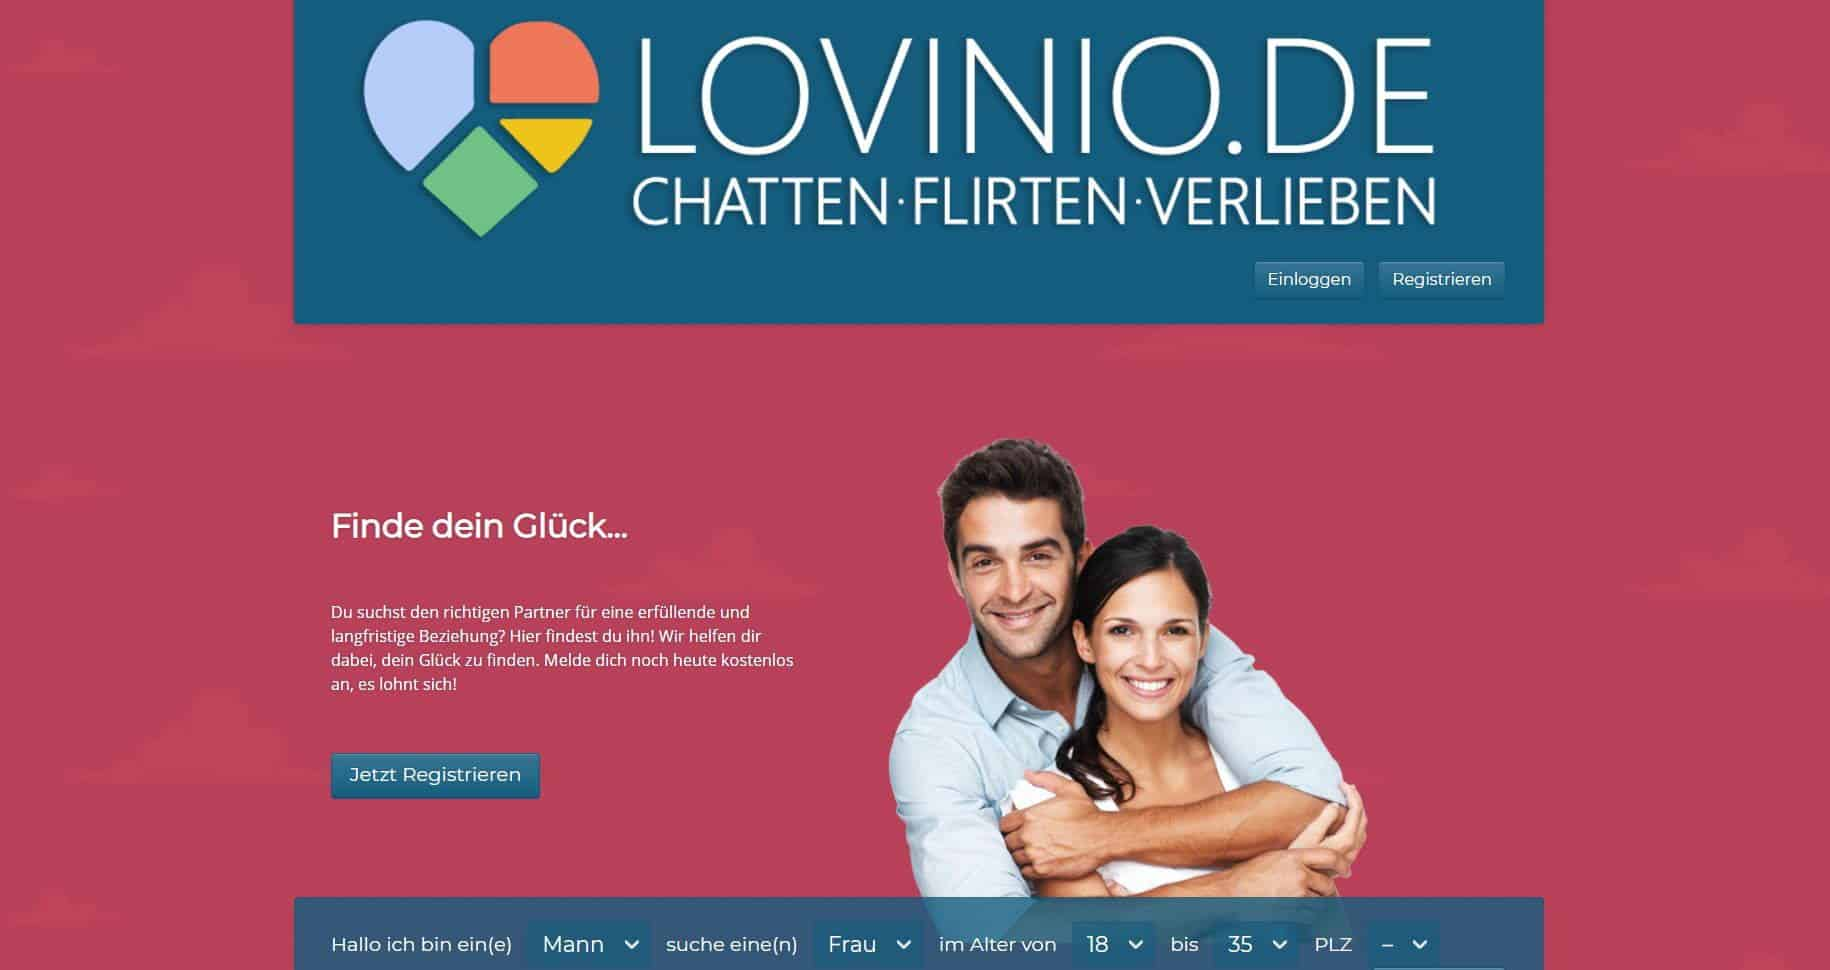 Testbericht: Lovinio.de Abzocke